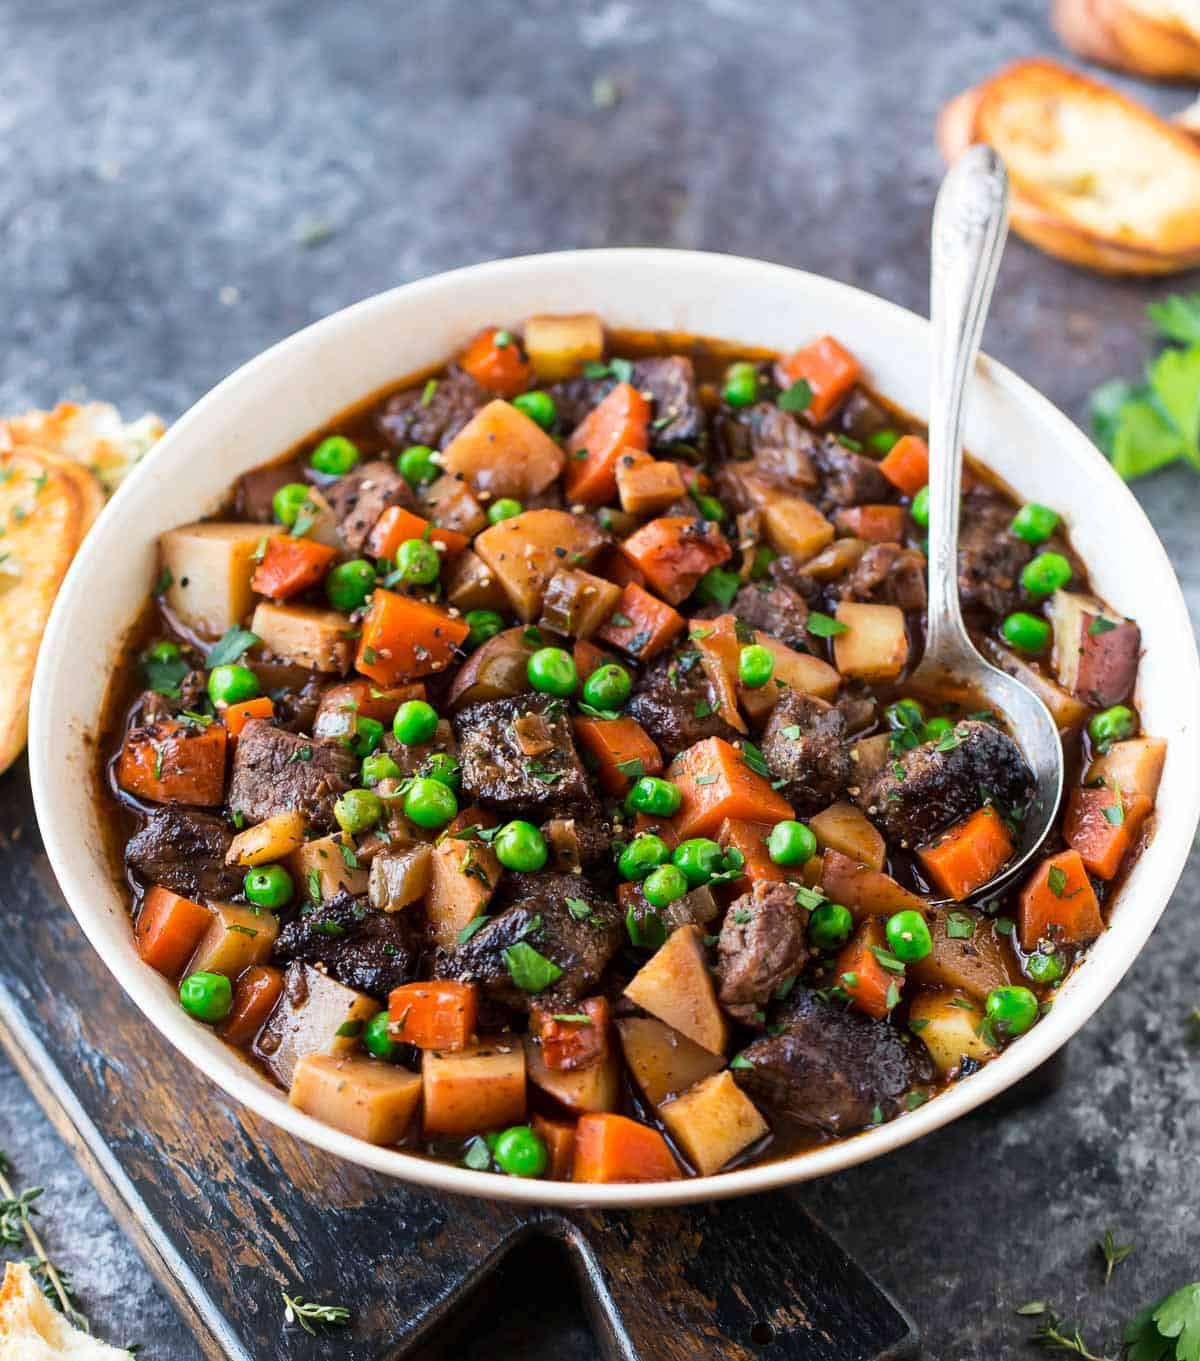 Healthy Ground Beef Crock Pot Recipes  Crock Pot Beef Stew Recipe